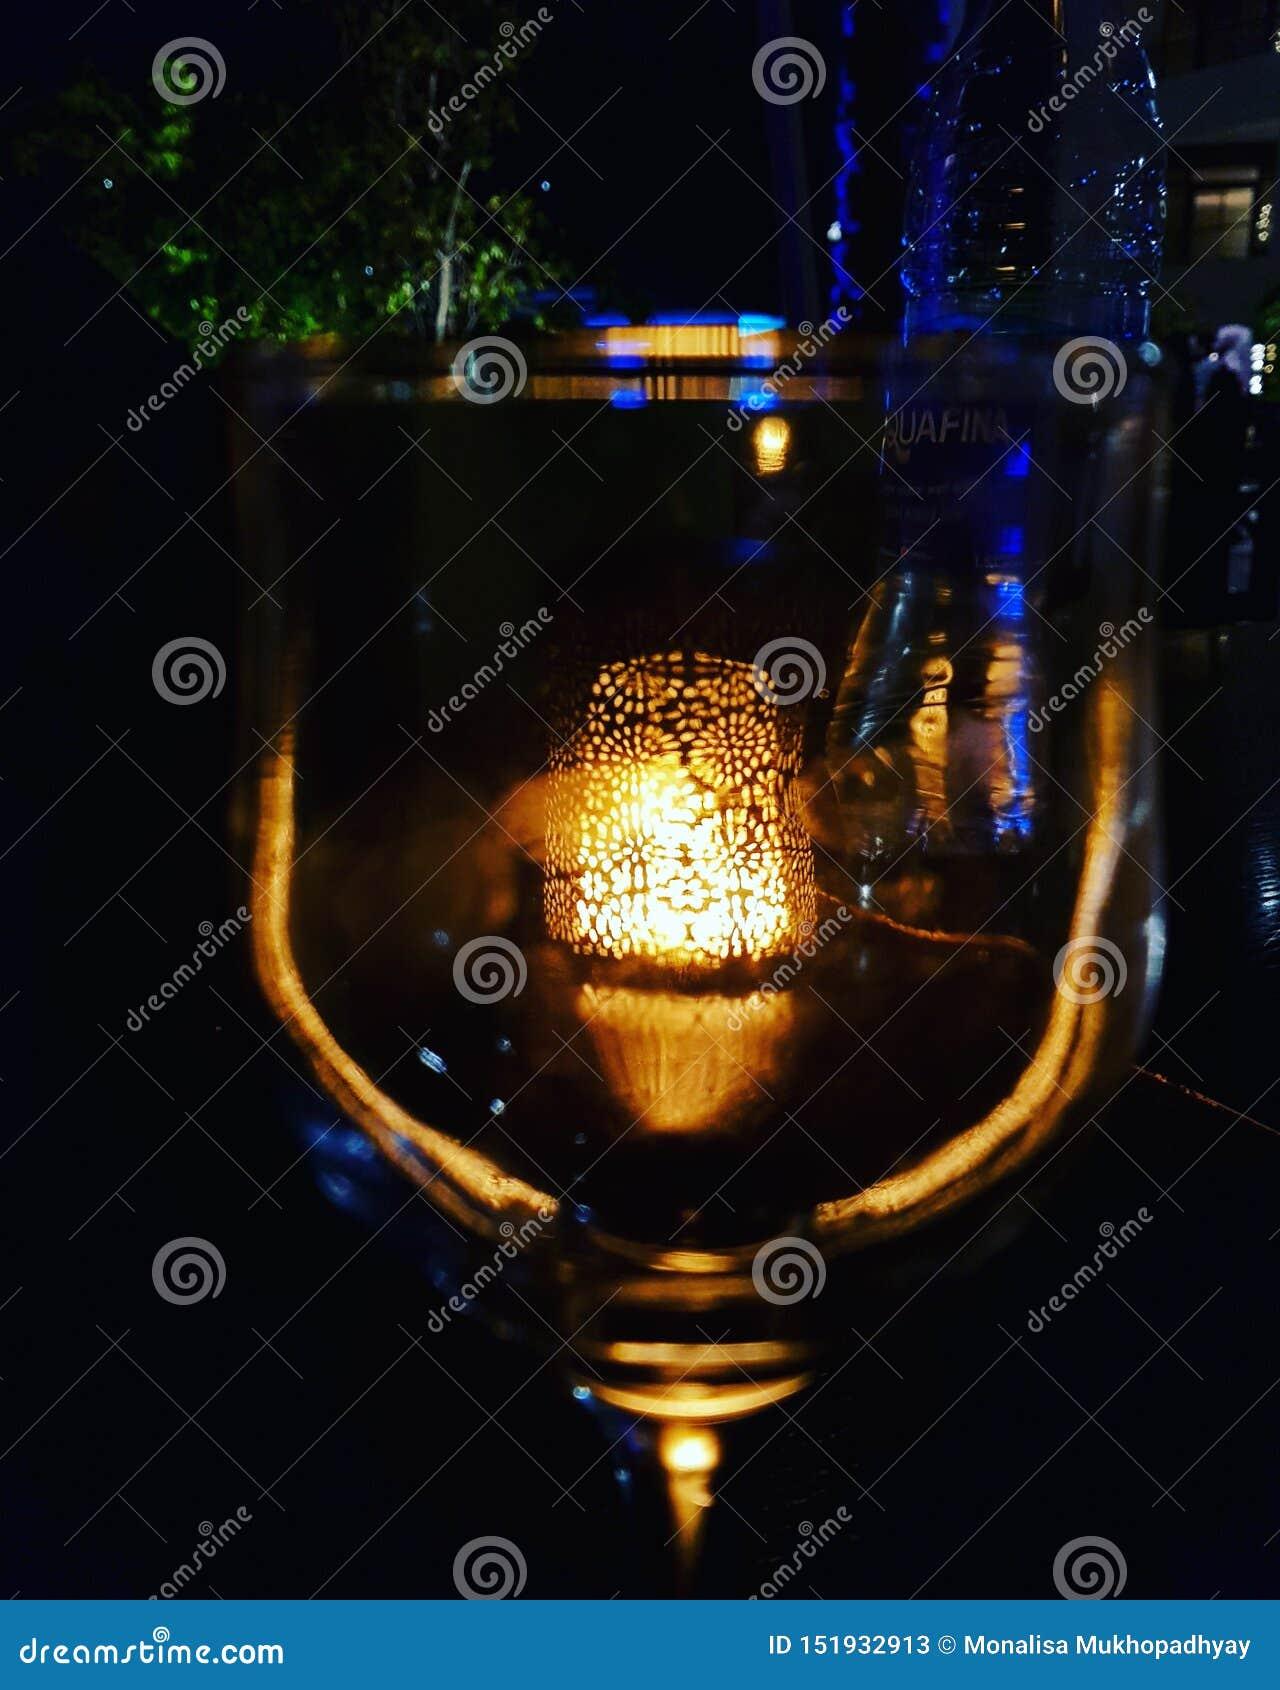 Lumi?re dans un verre